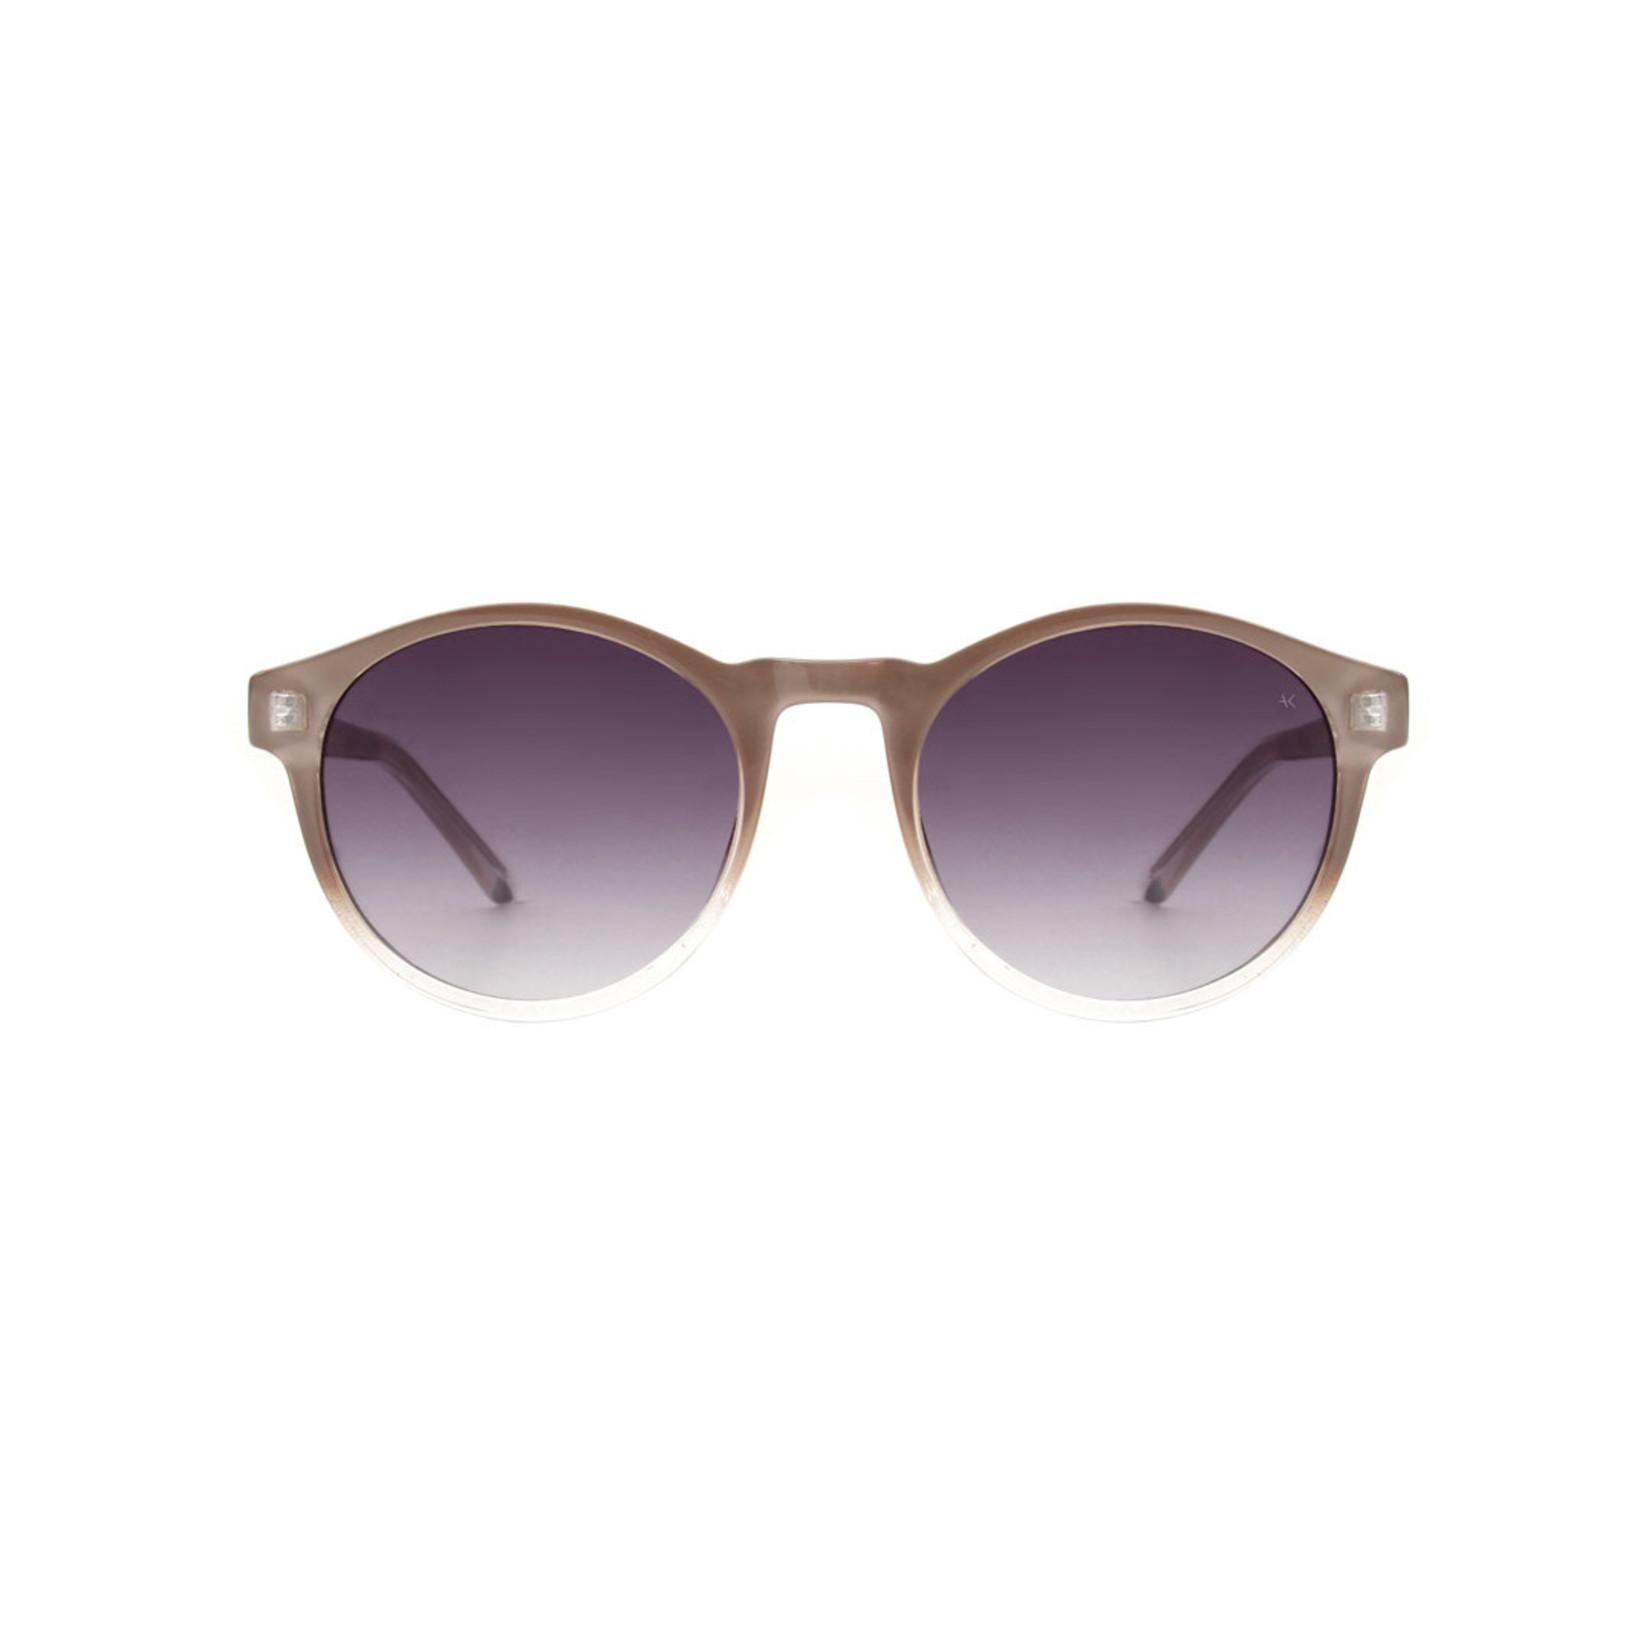 Kjearbede Kjearbede zonnebril Marvin Light Grey/Crystal/KL1708-11